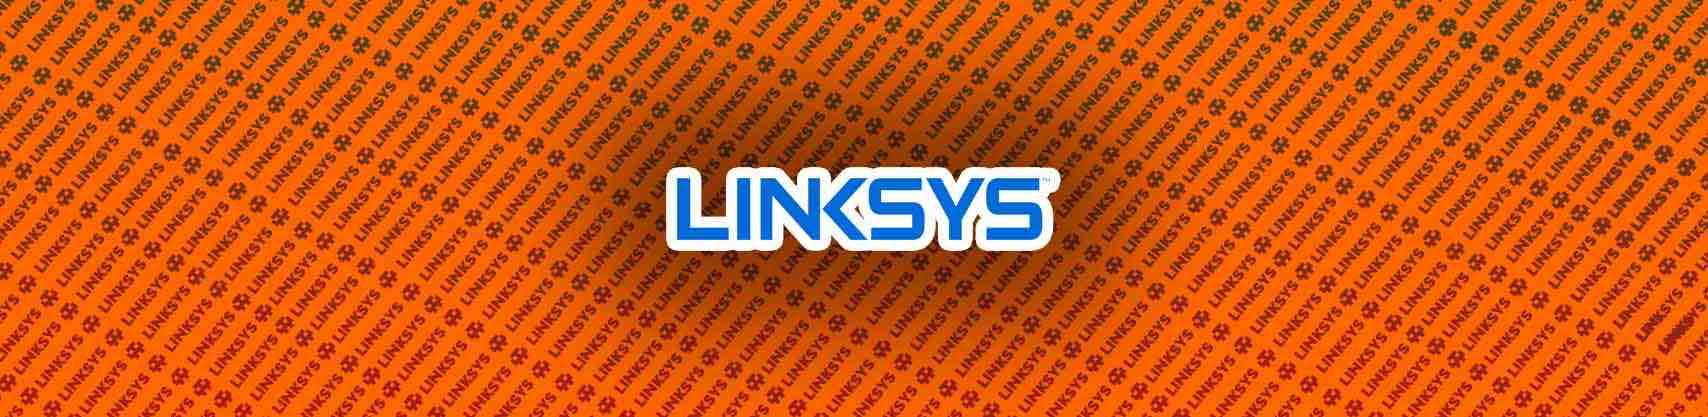 Linksys E1500 Manual